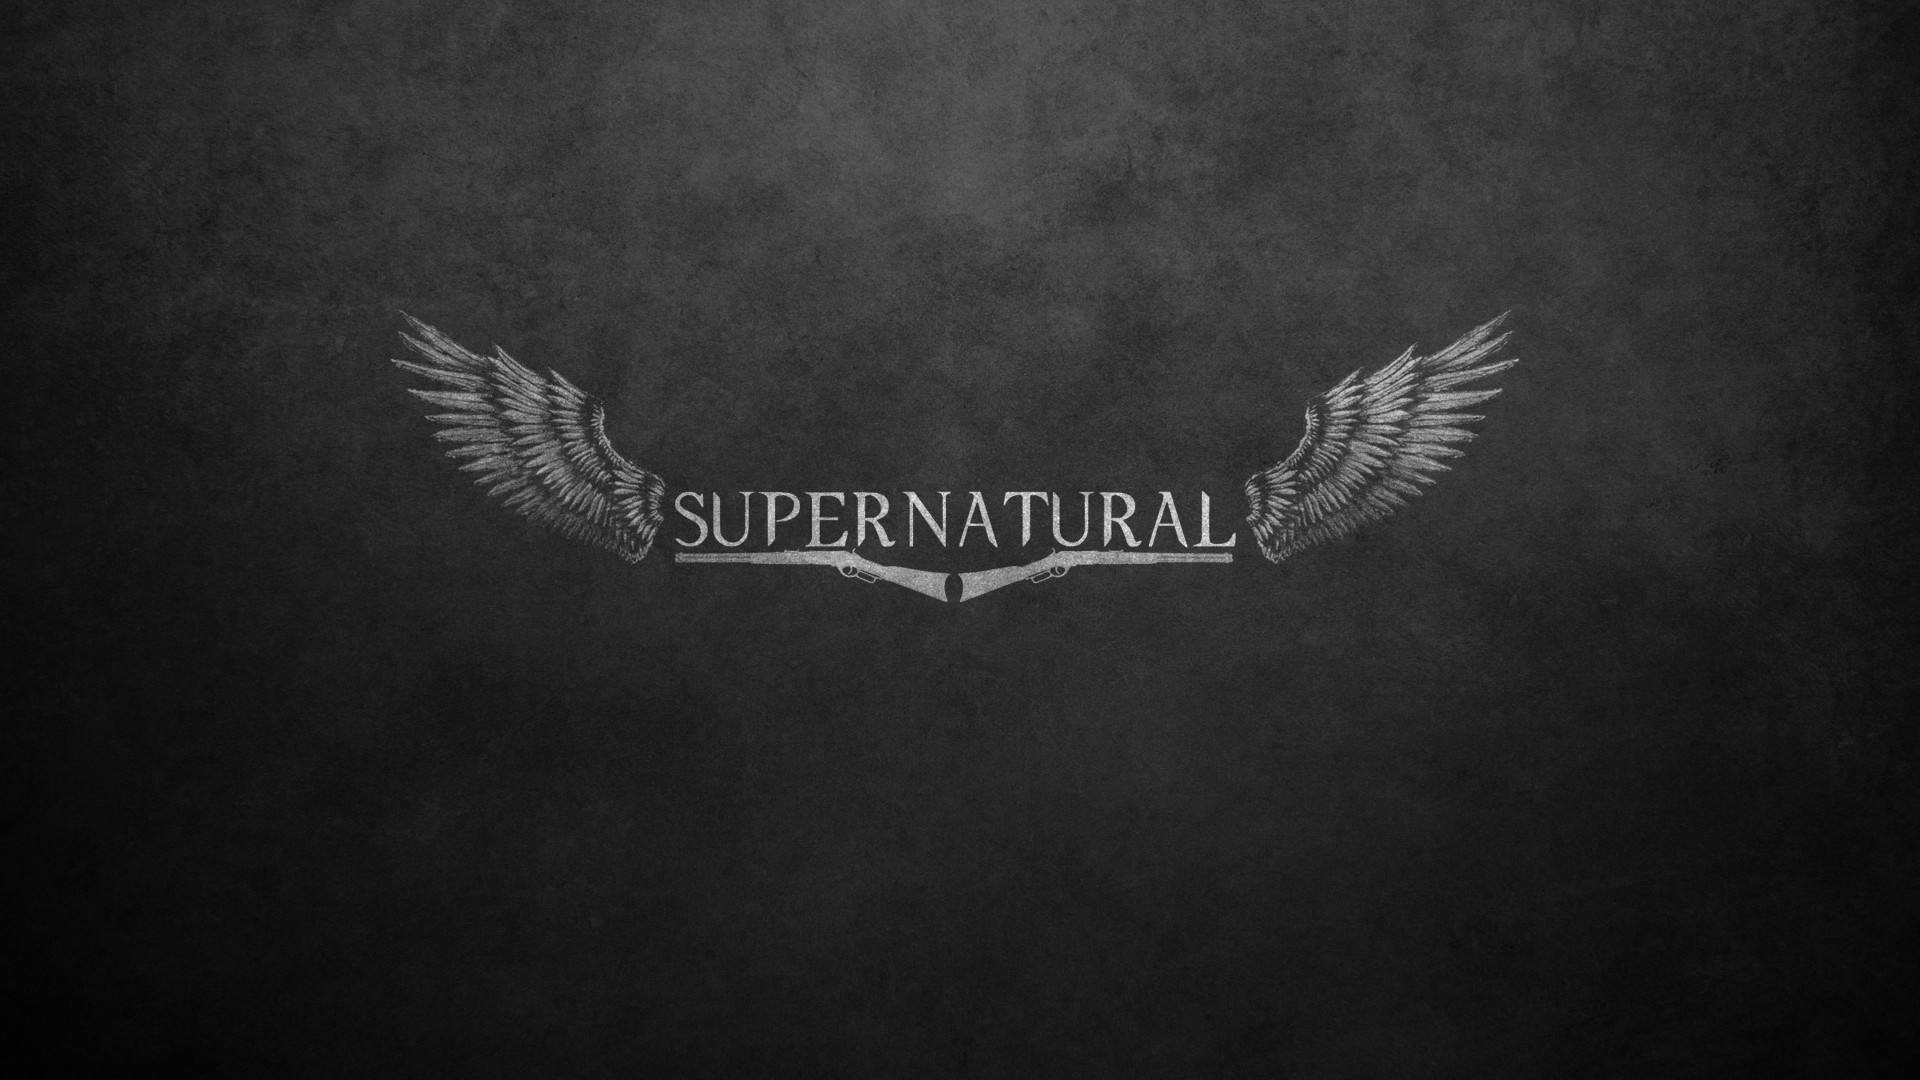 supernatural wallpaper 2018 79 images